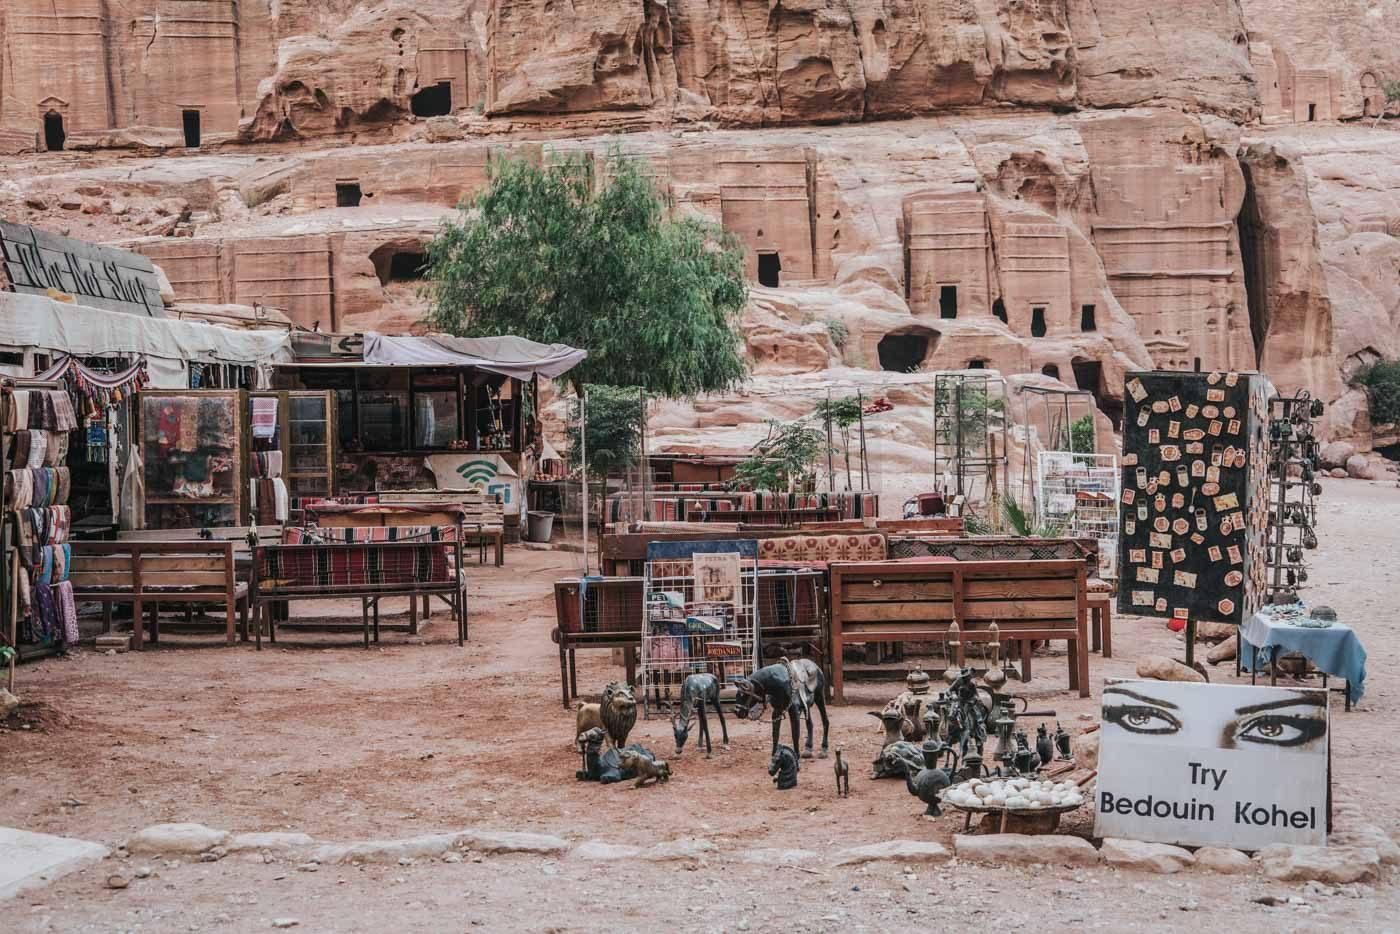 Souvenir shop and cafe in Petra, Jordan